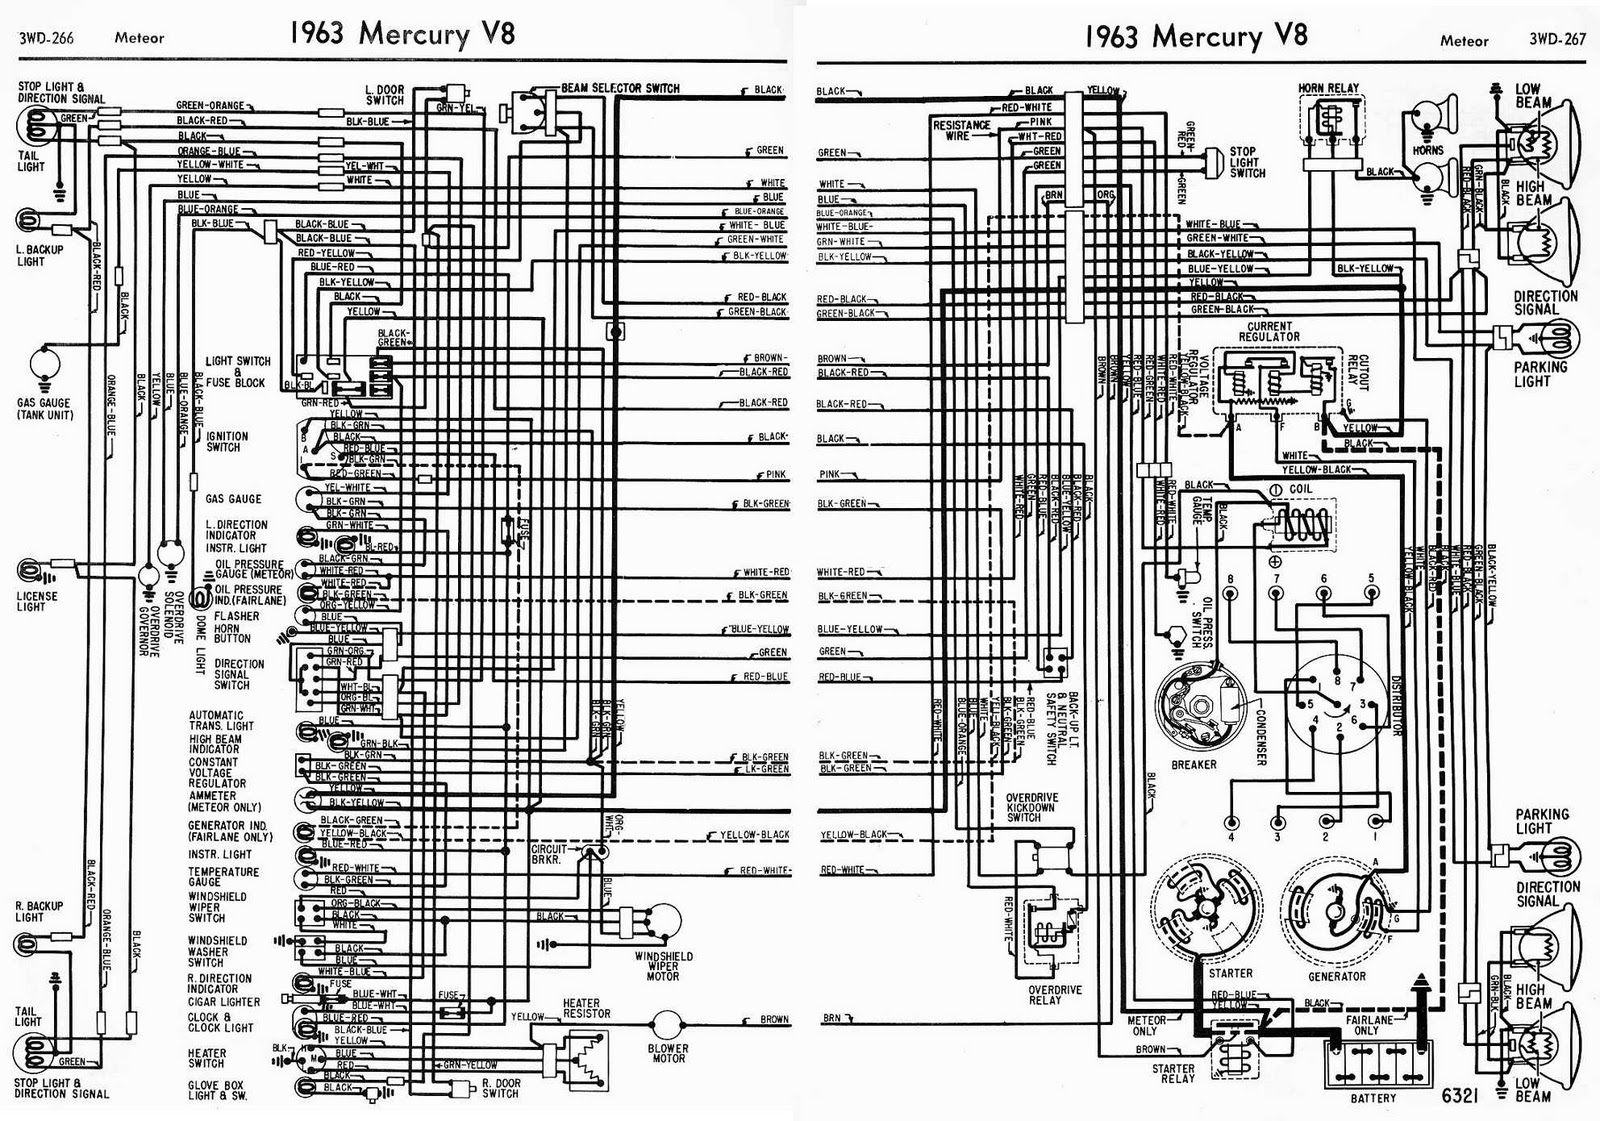 Enchanting honda z50 wiring diagram embellishment wiring standart captivating 1972 honda z50 wiring diagram images best image wiring swarovskicordoba Gallery